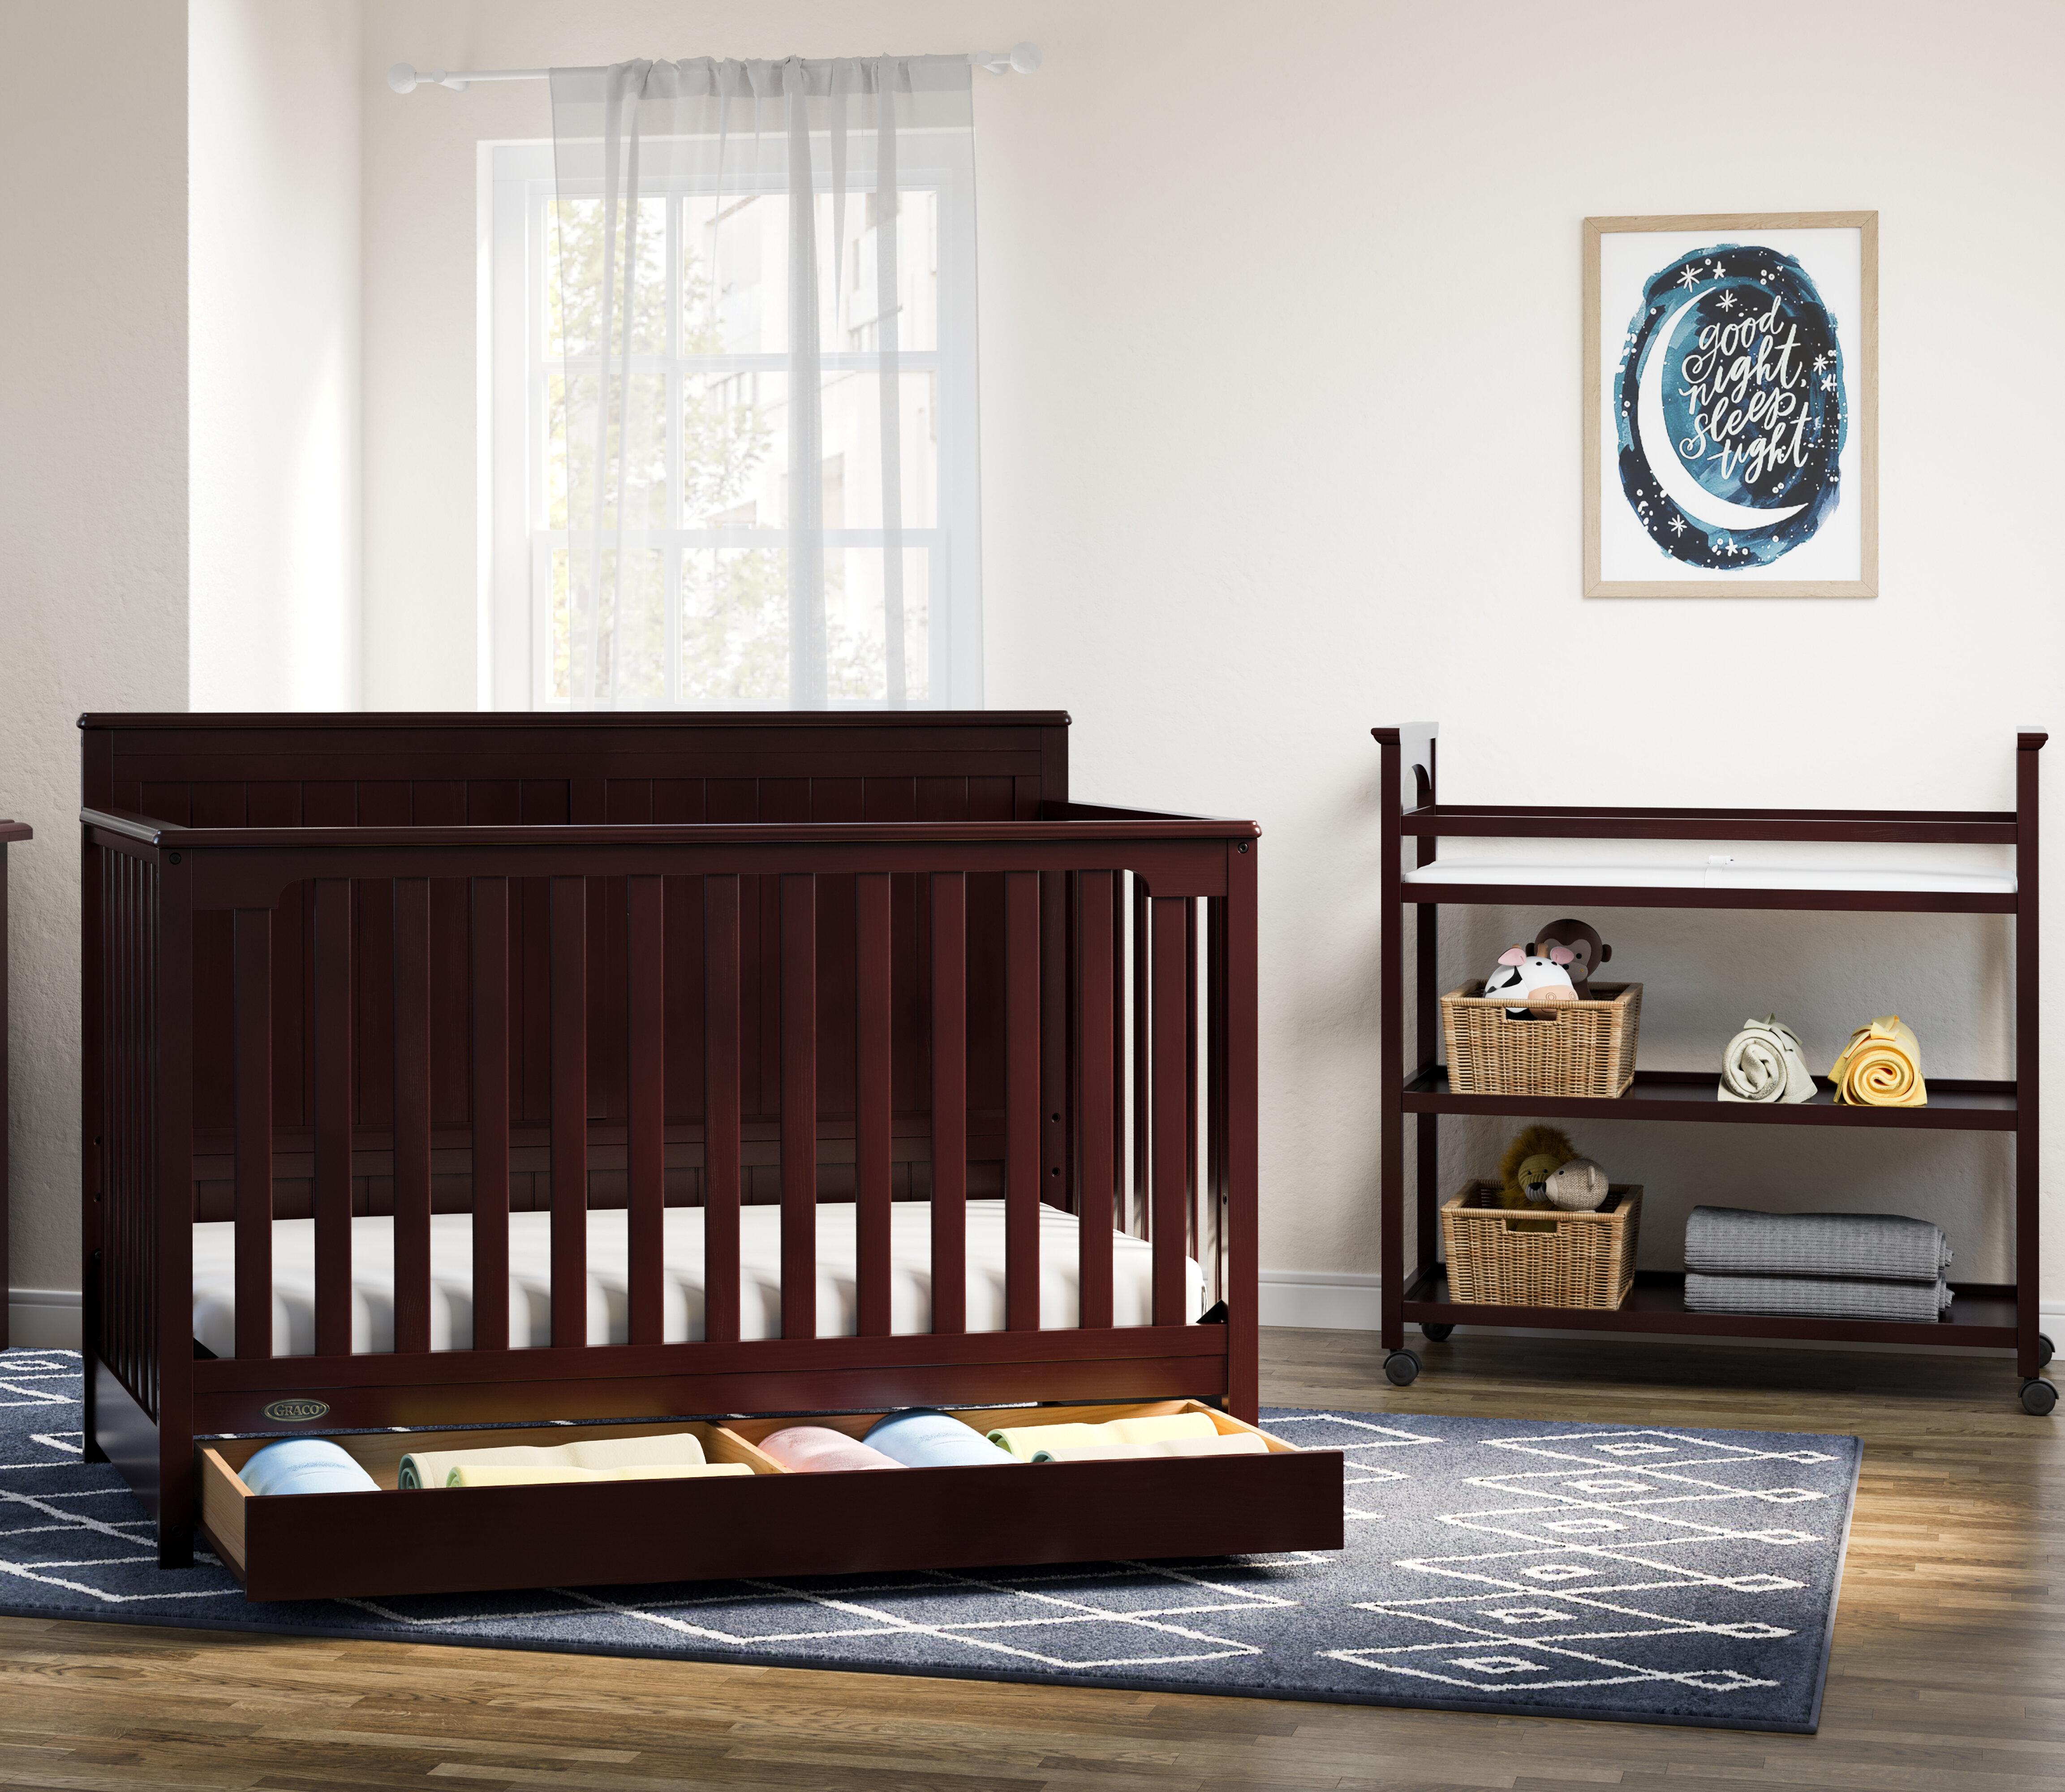 Graco Hadley 4 In 1 Convertible 2 Piece Nursery Furniture Set Reviews Wayfair